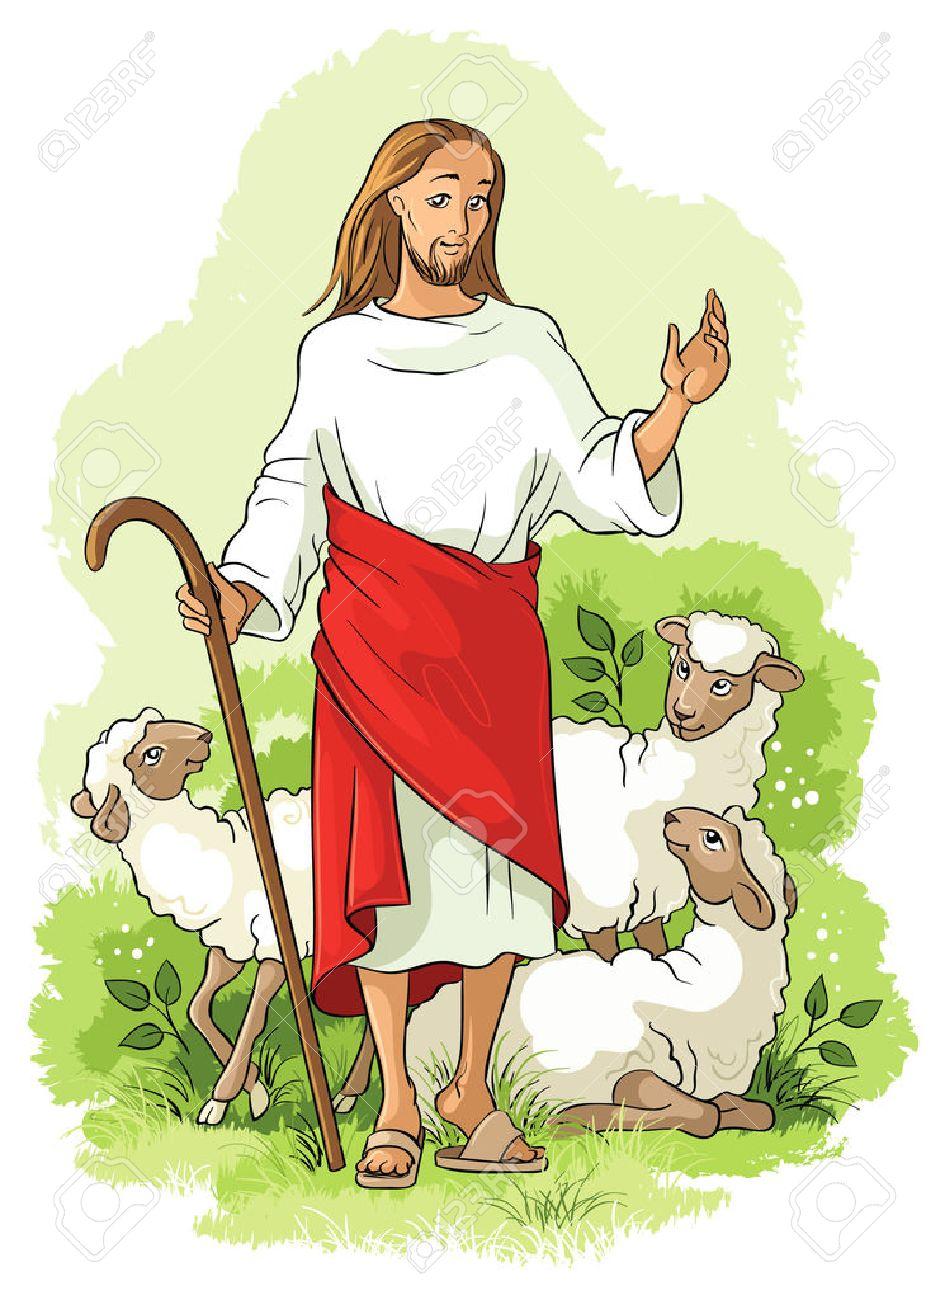 Jesus is a good shepherd. Christian illustration - 36202409